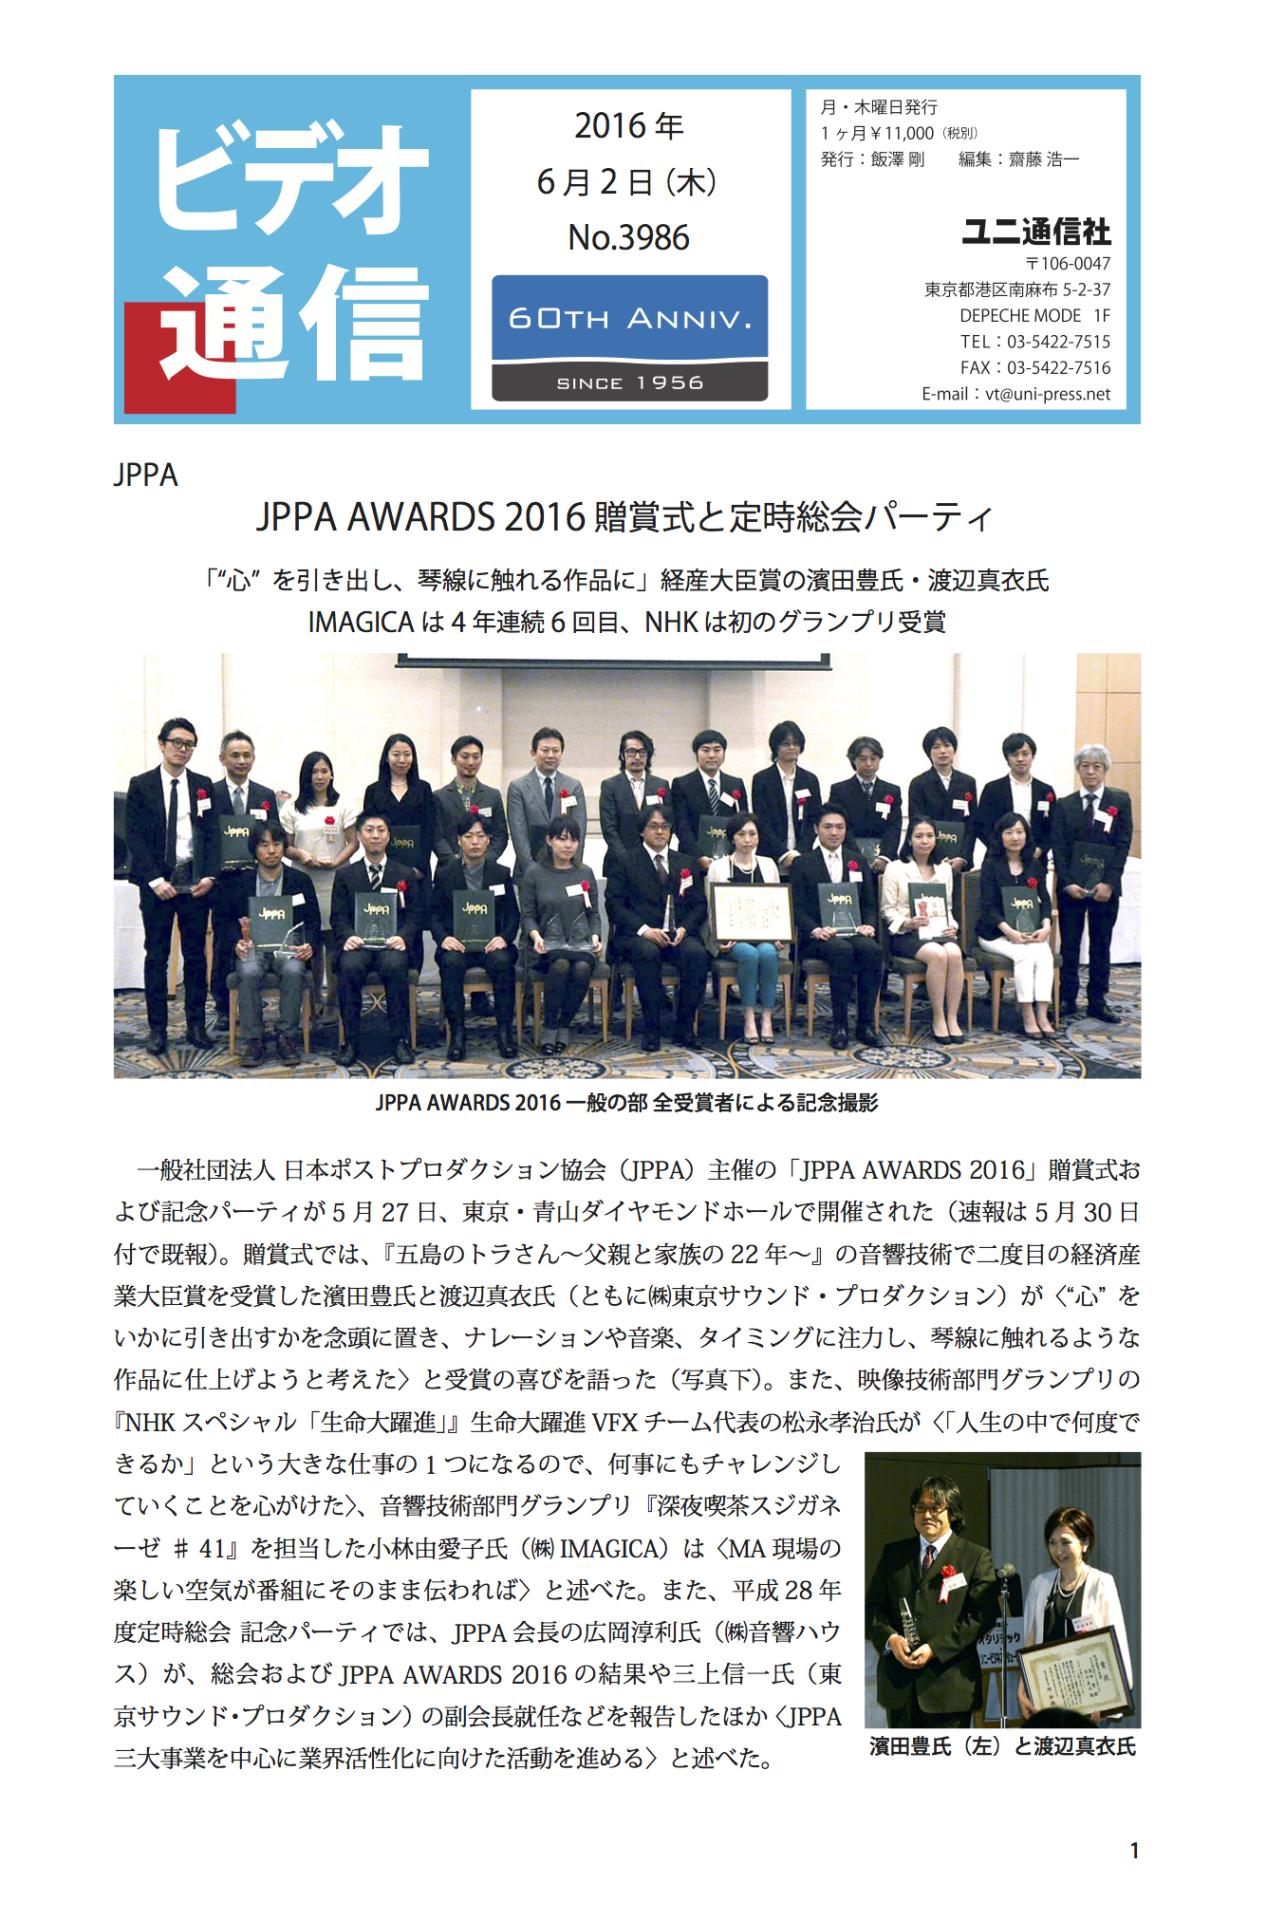 JPPAAWARD2016記事3